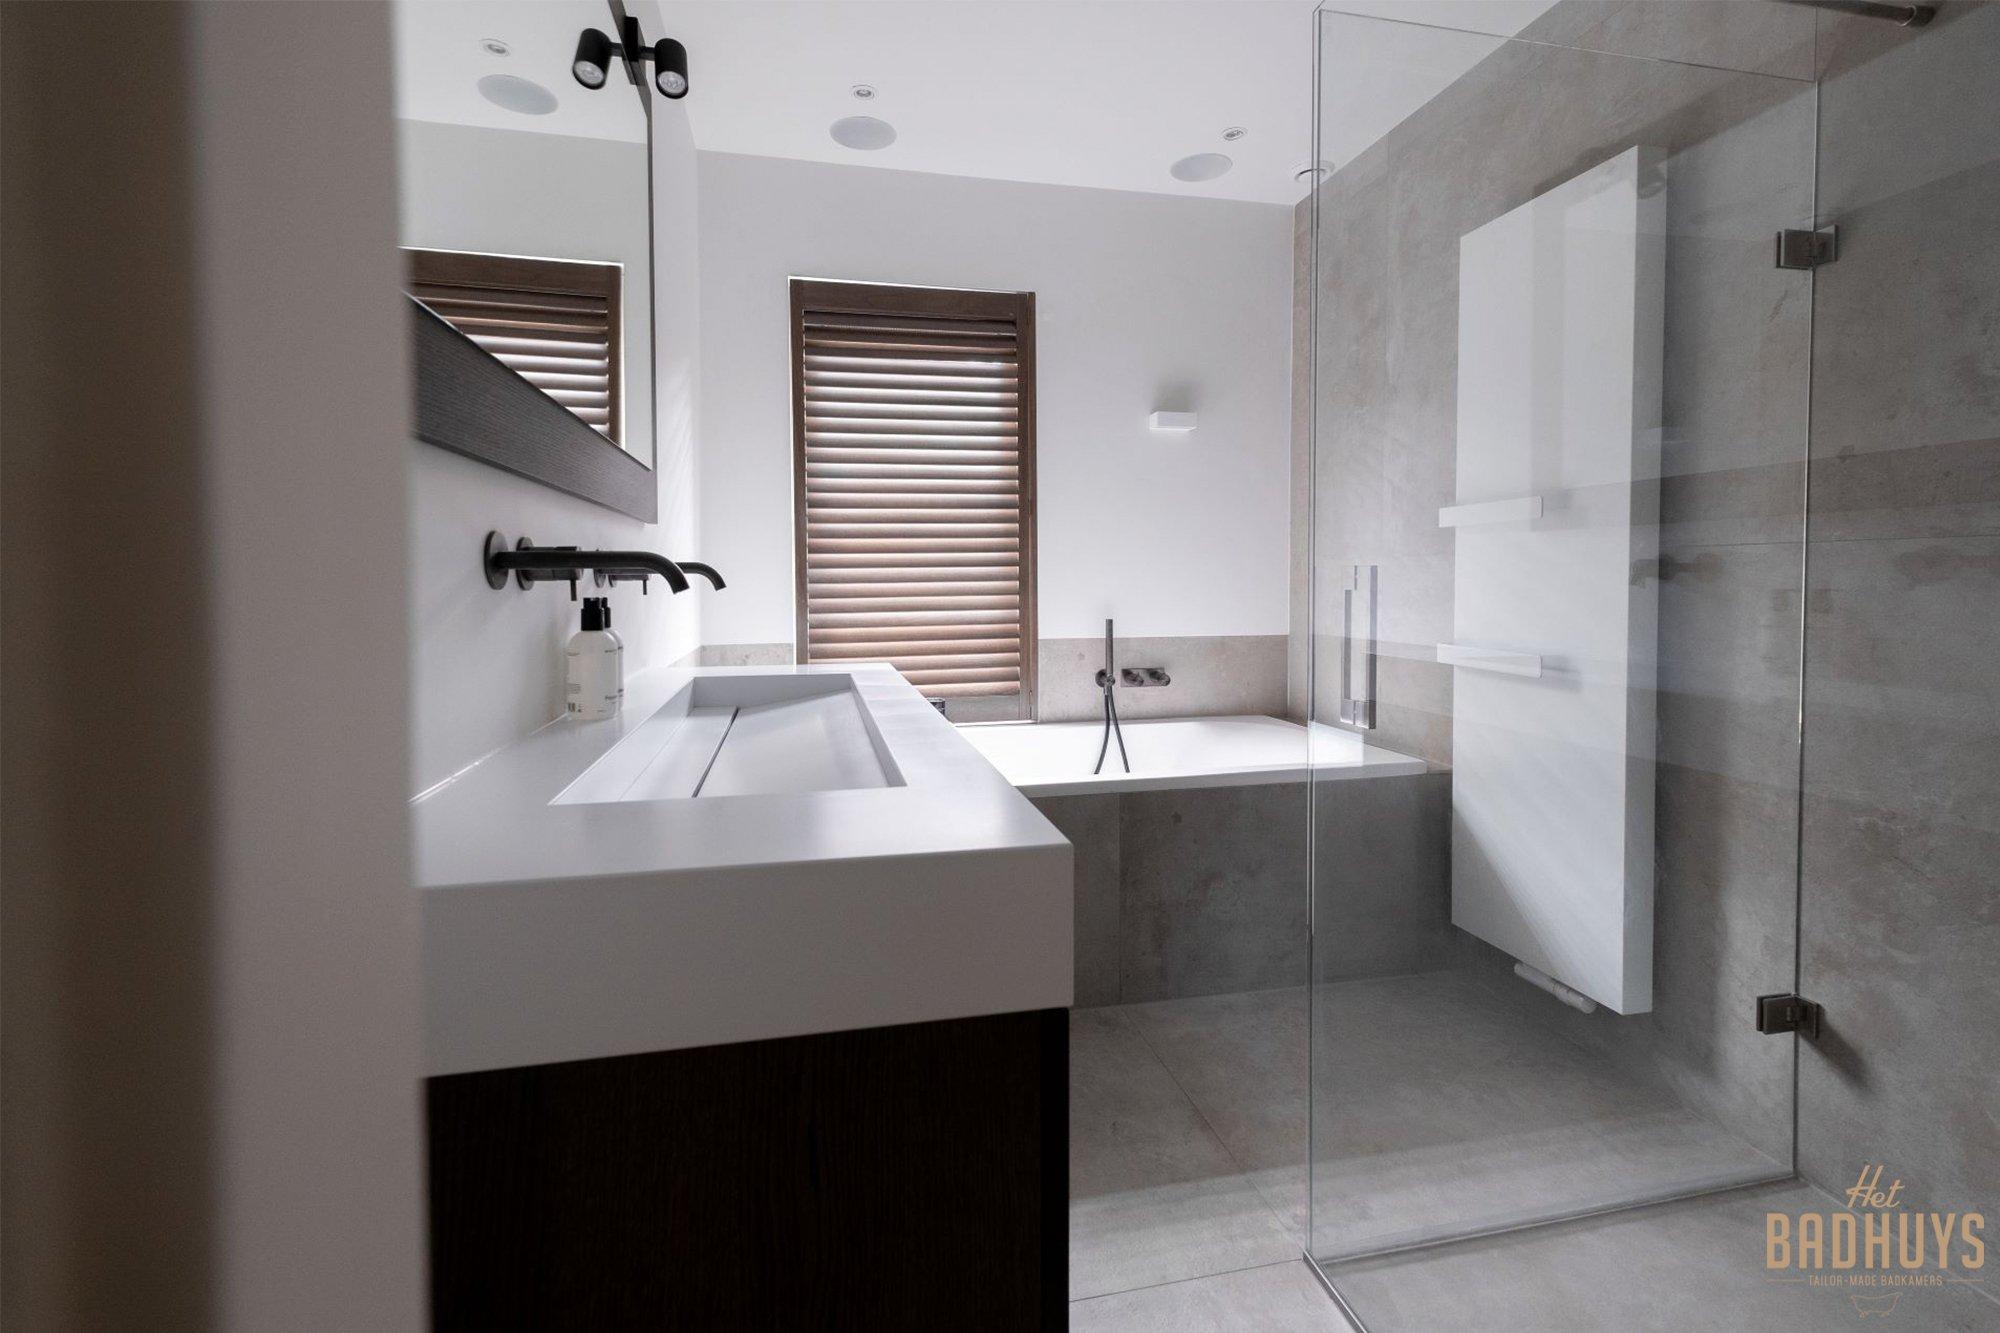 Maatwerk badkamermeubel in badkamer gerealiseerd door Het Badhuys in Breda.